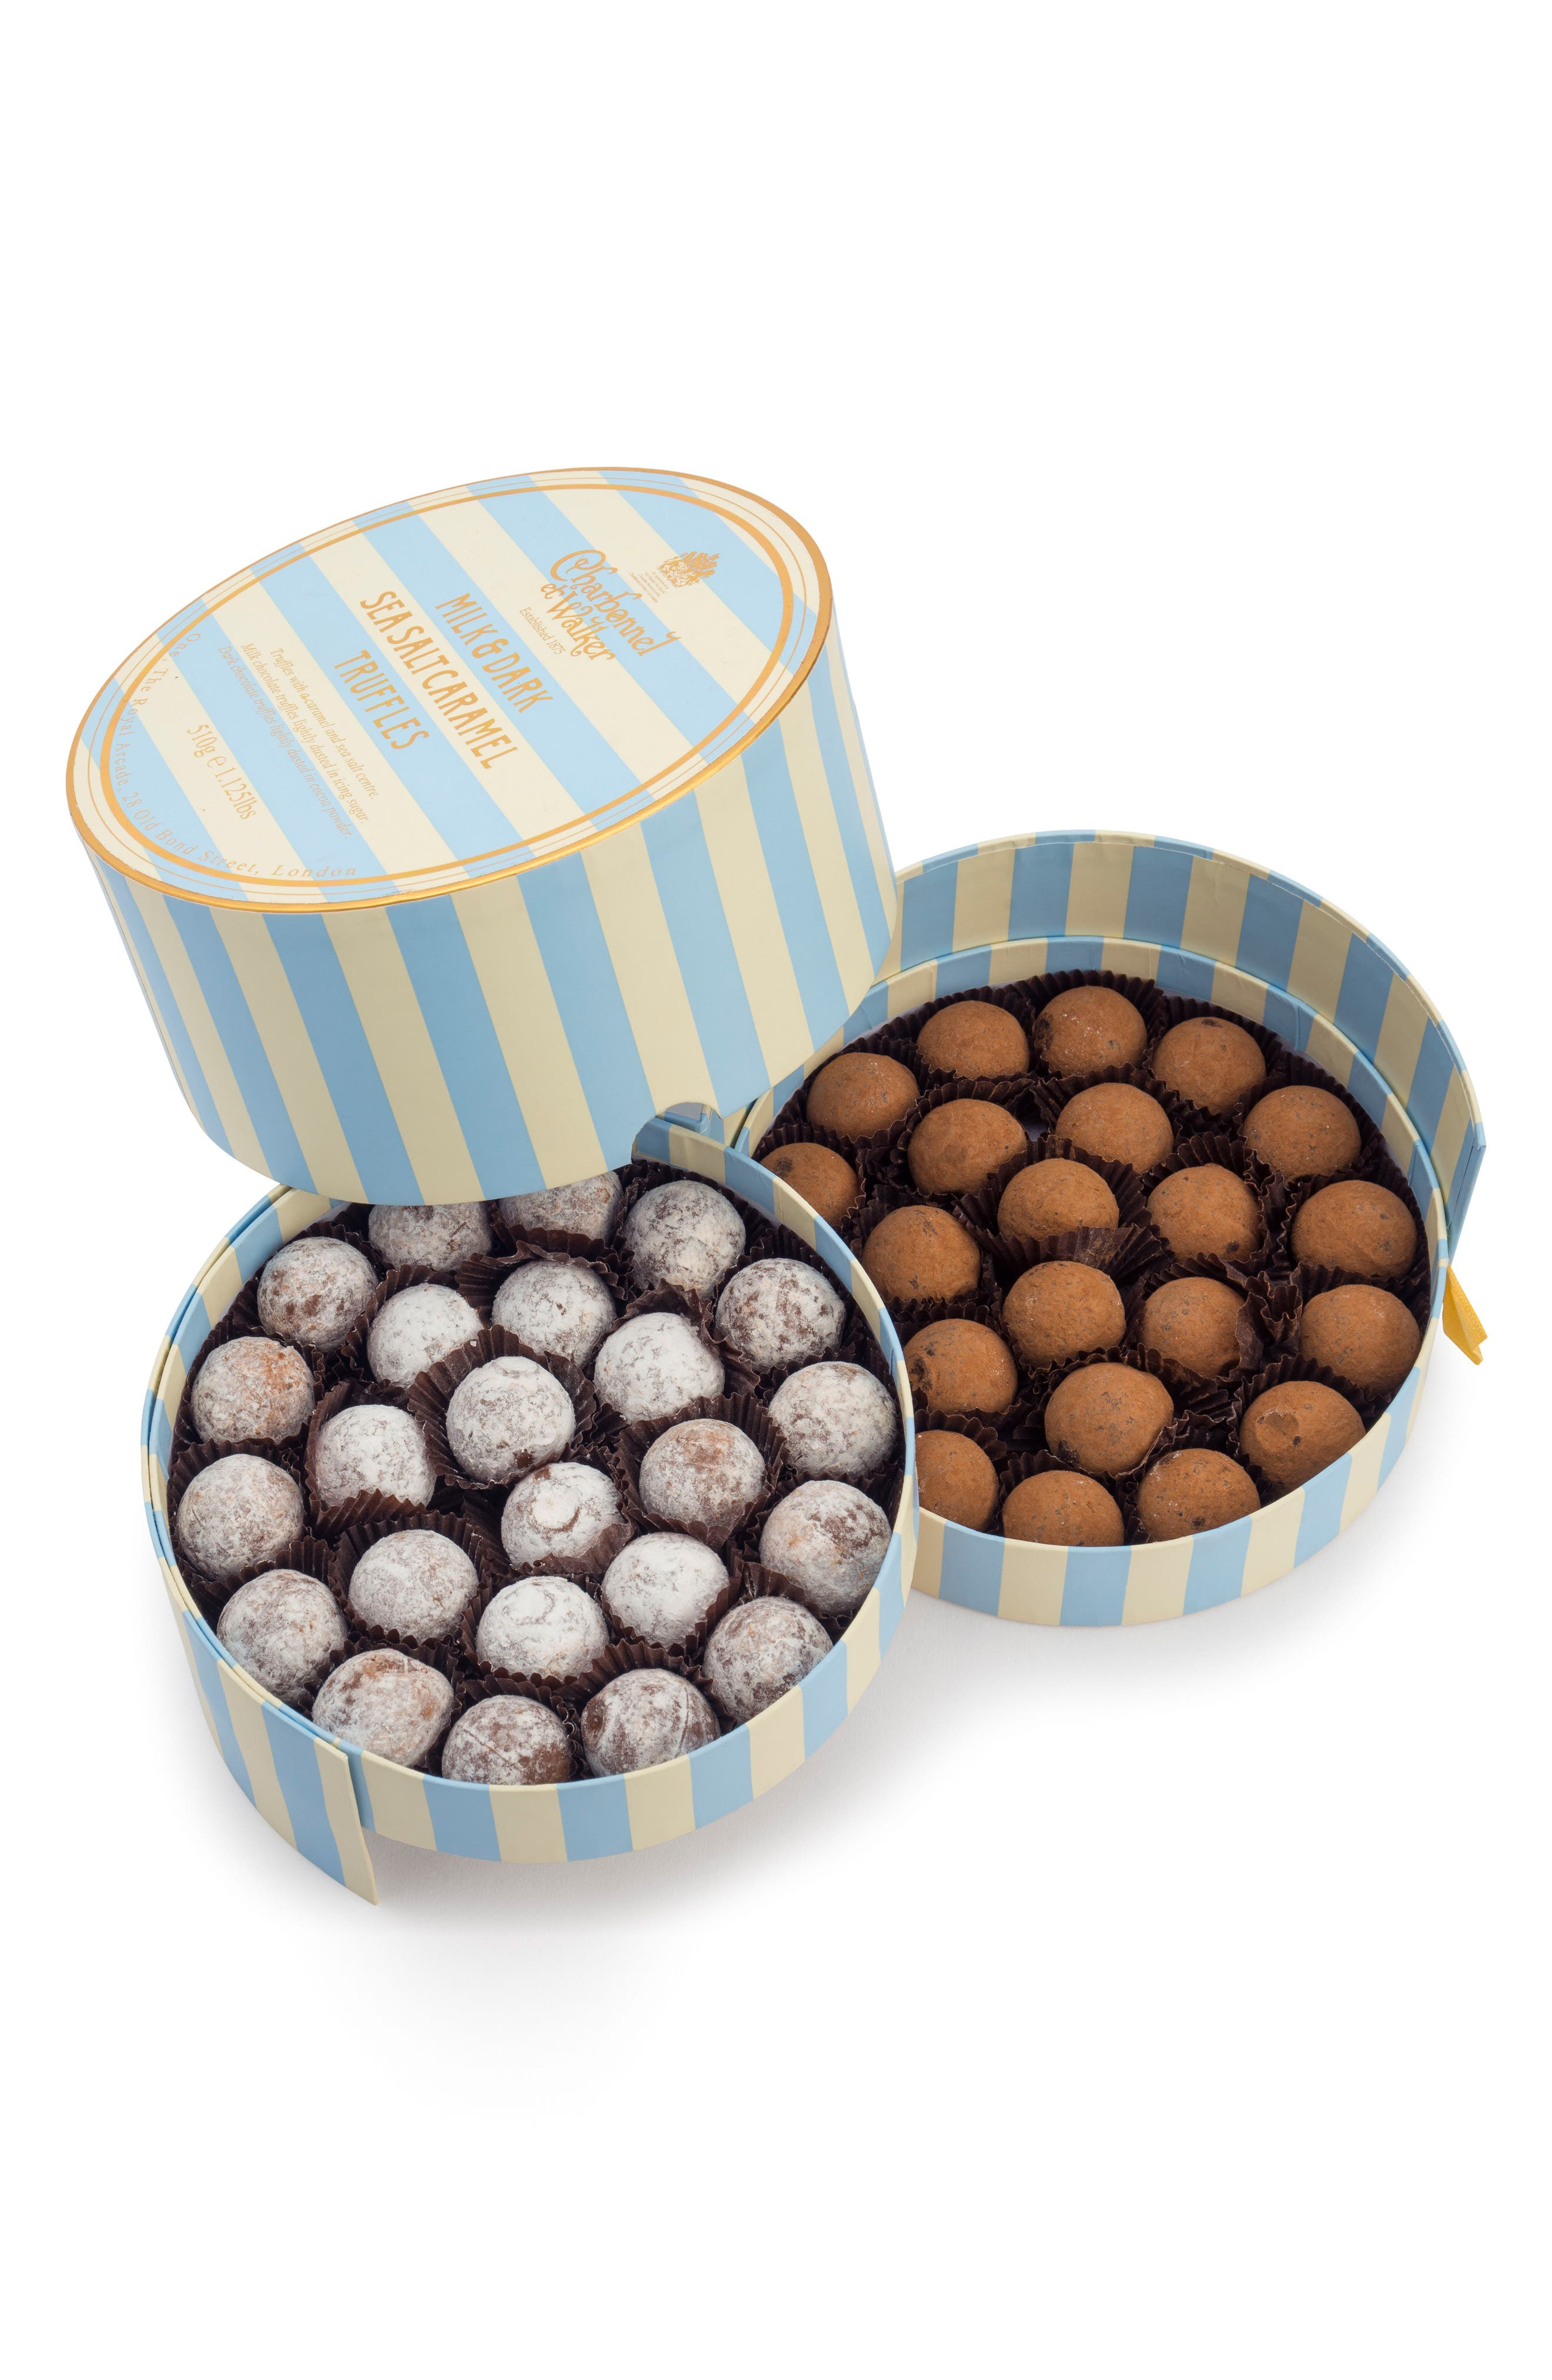 Flavored Chocolate Truffles in Gift Box,                             Main thumbnail 1, color,                             MILK/ DARK SEA SALT